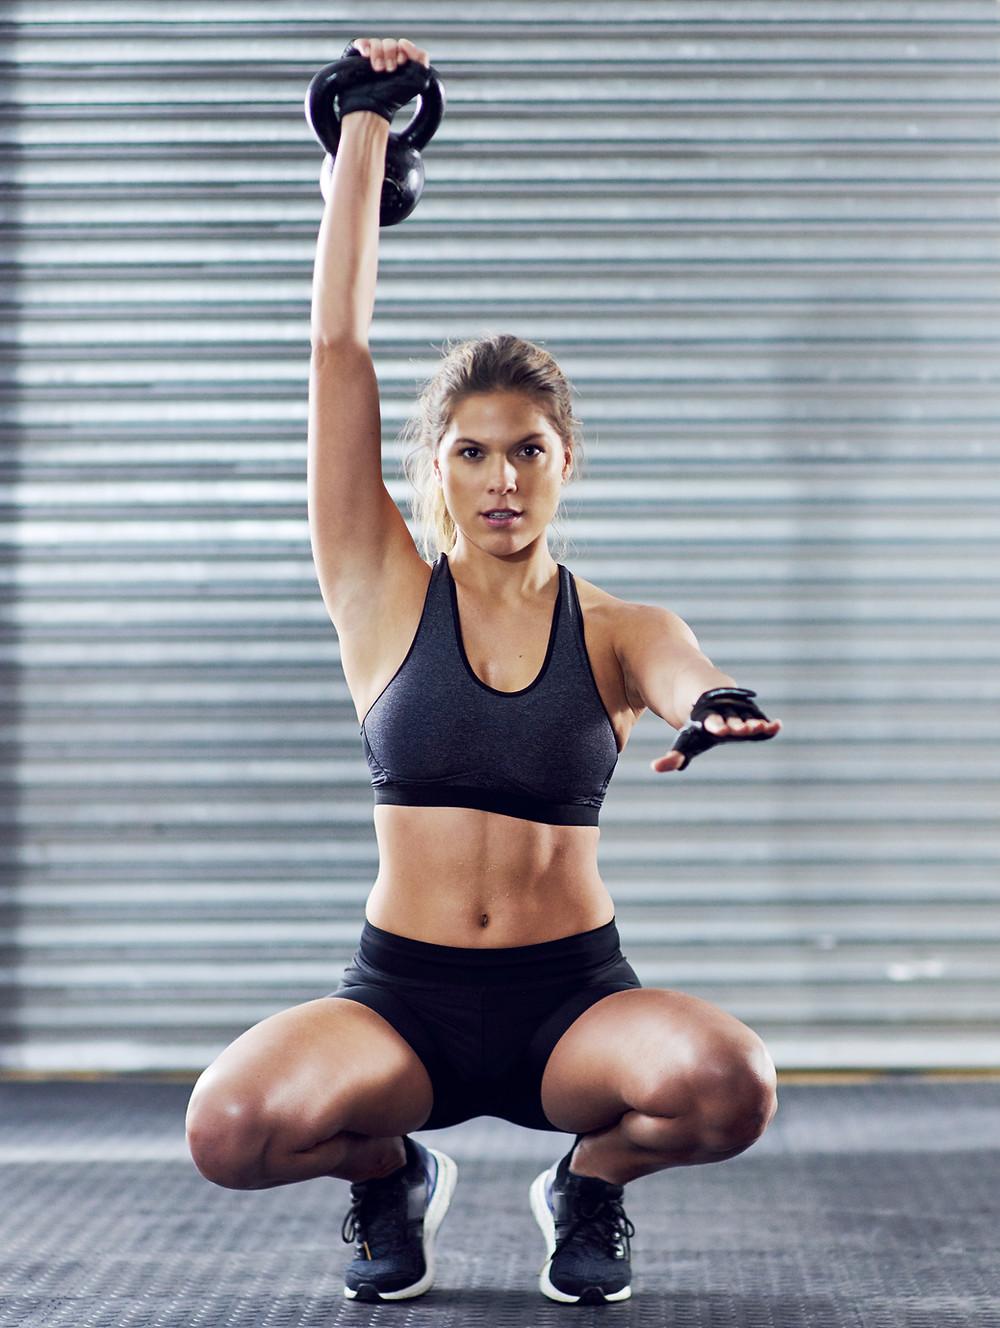 squat proof legging supplier - Blue Associates Sportswear Ltd